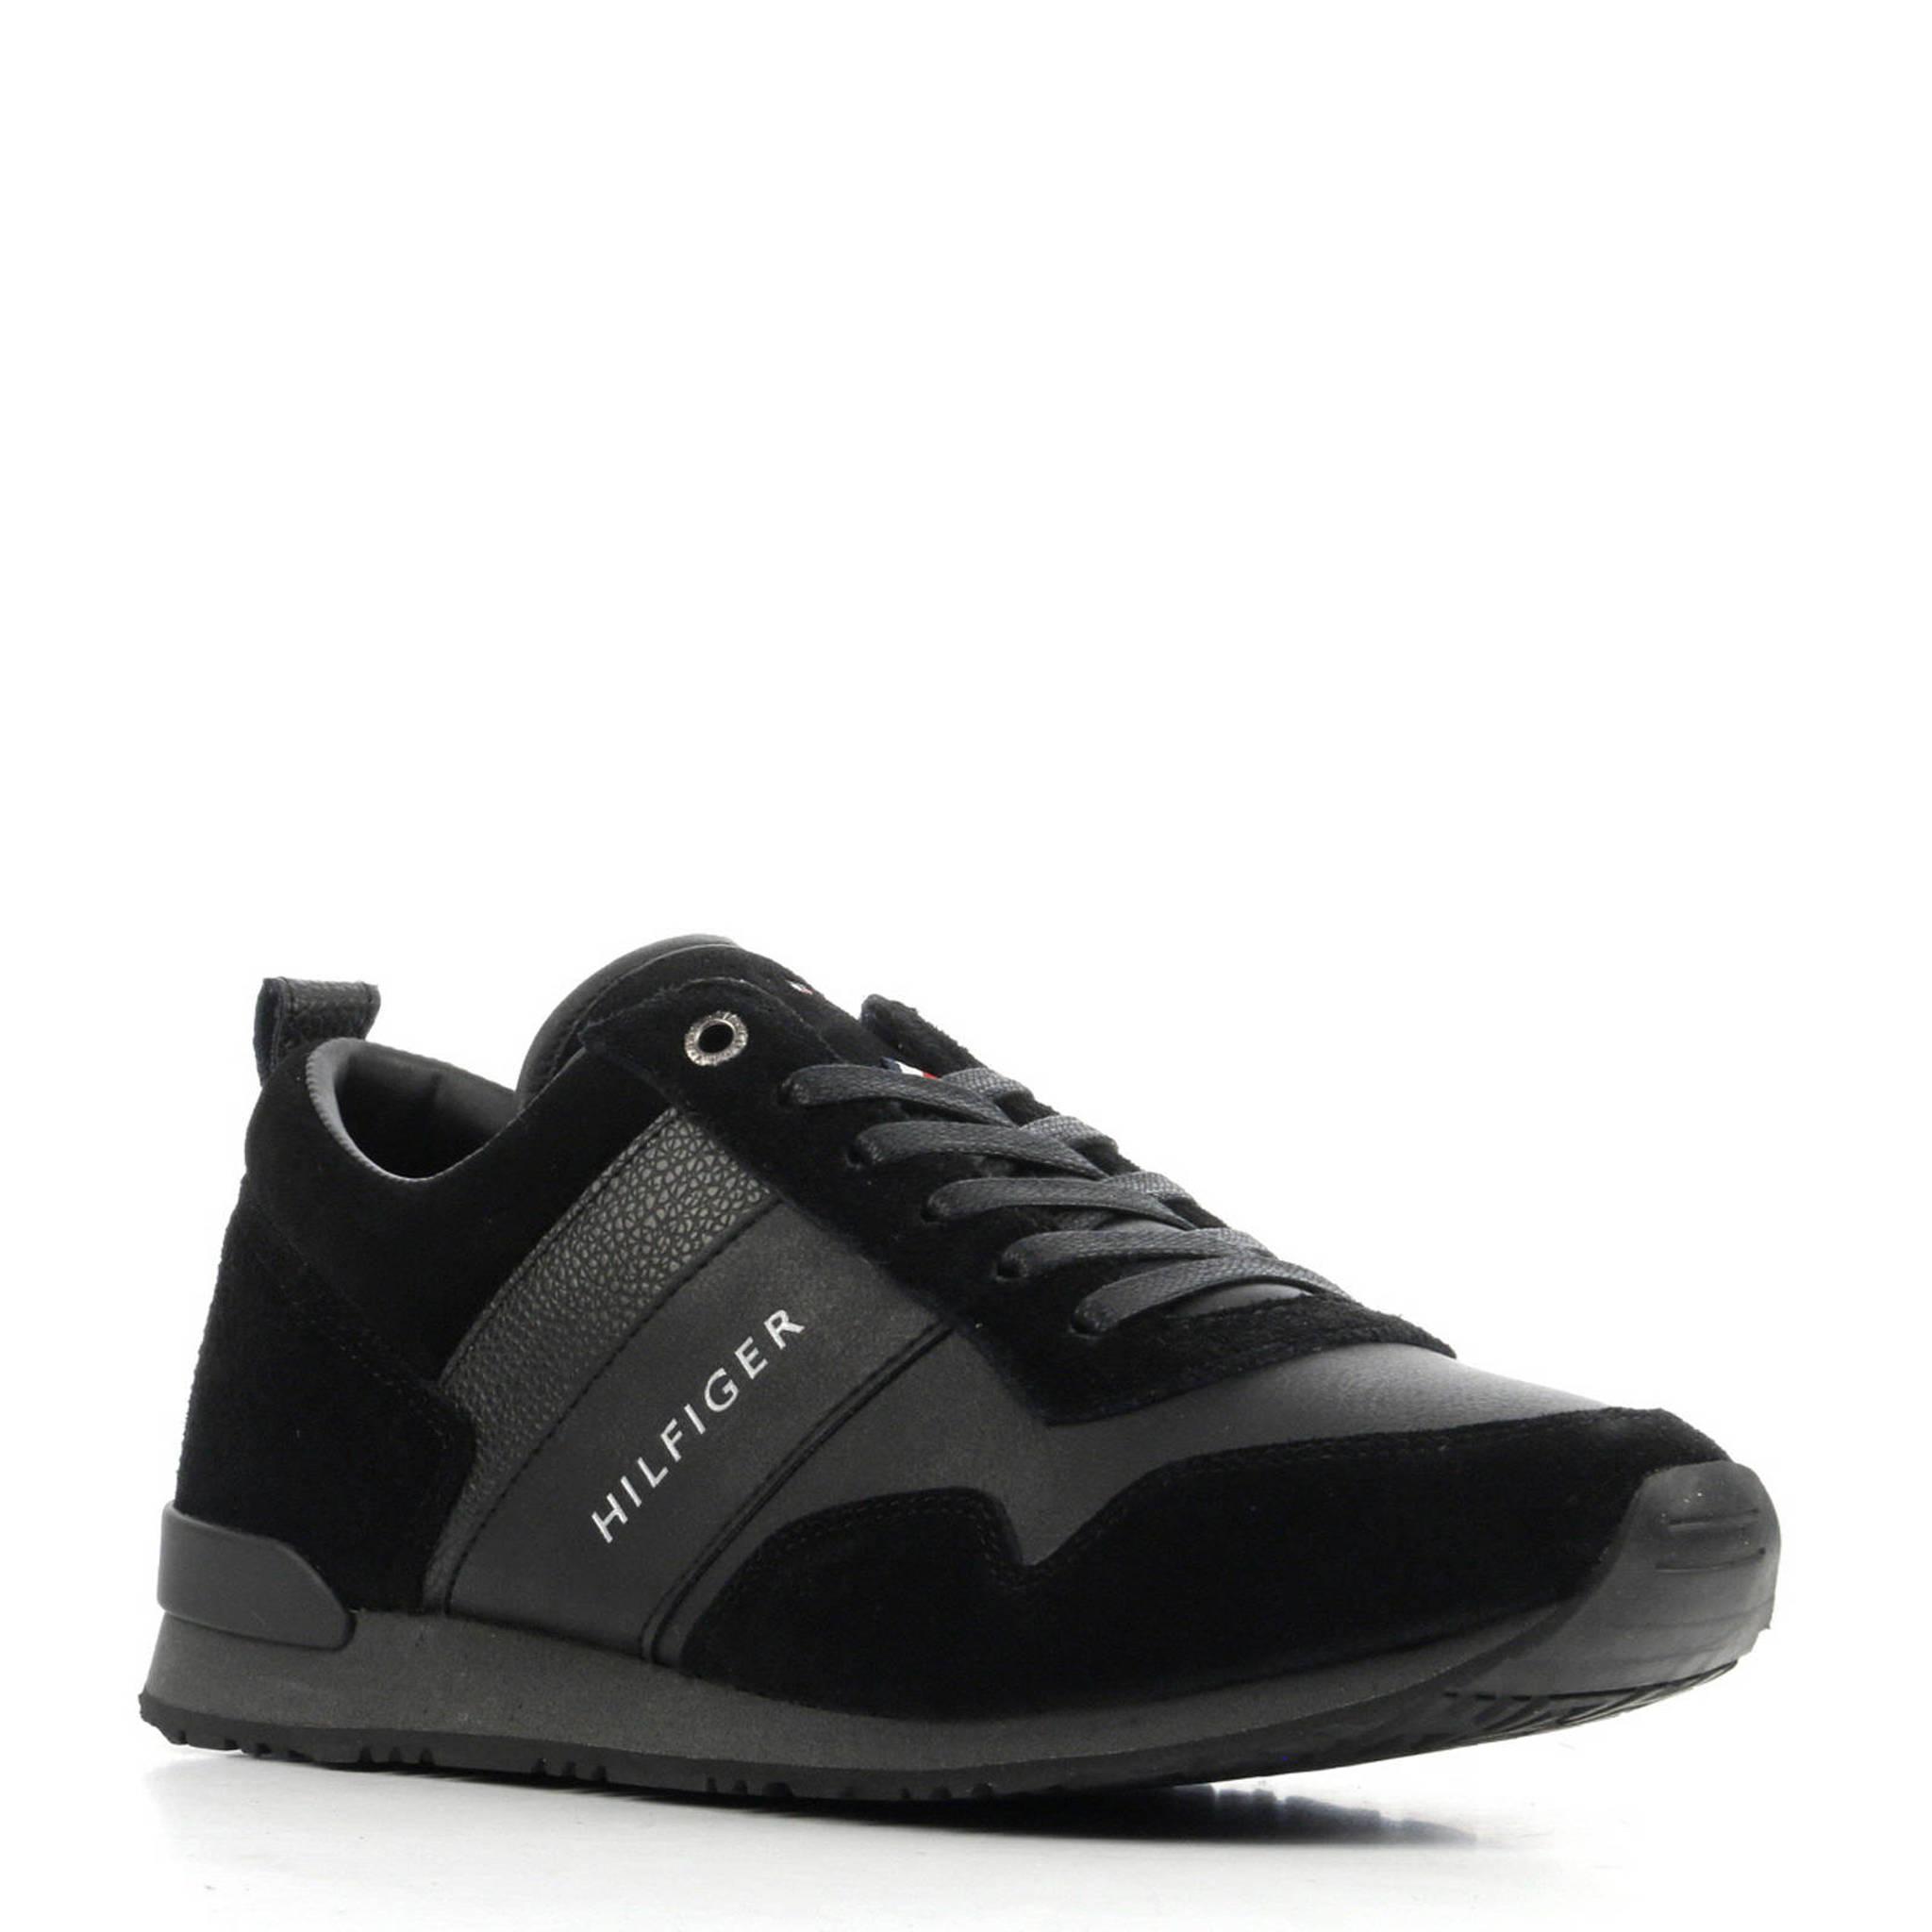 ef9c8a54edc Tommy Hilfiger suède sneakers zwart | wehkamp